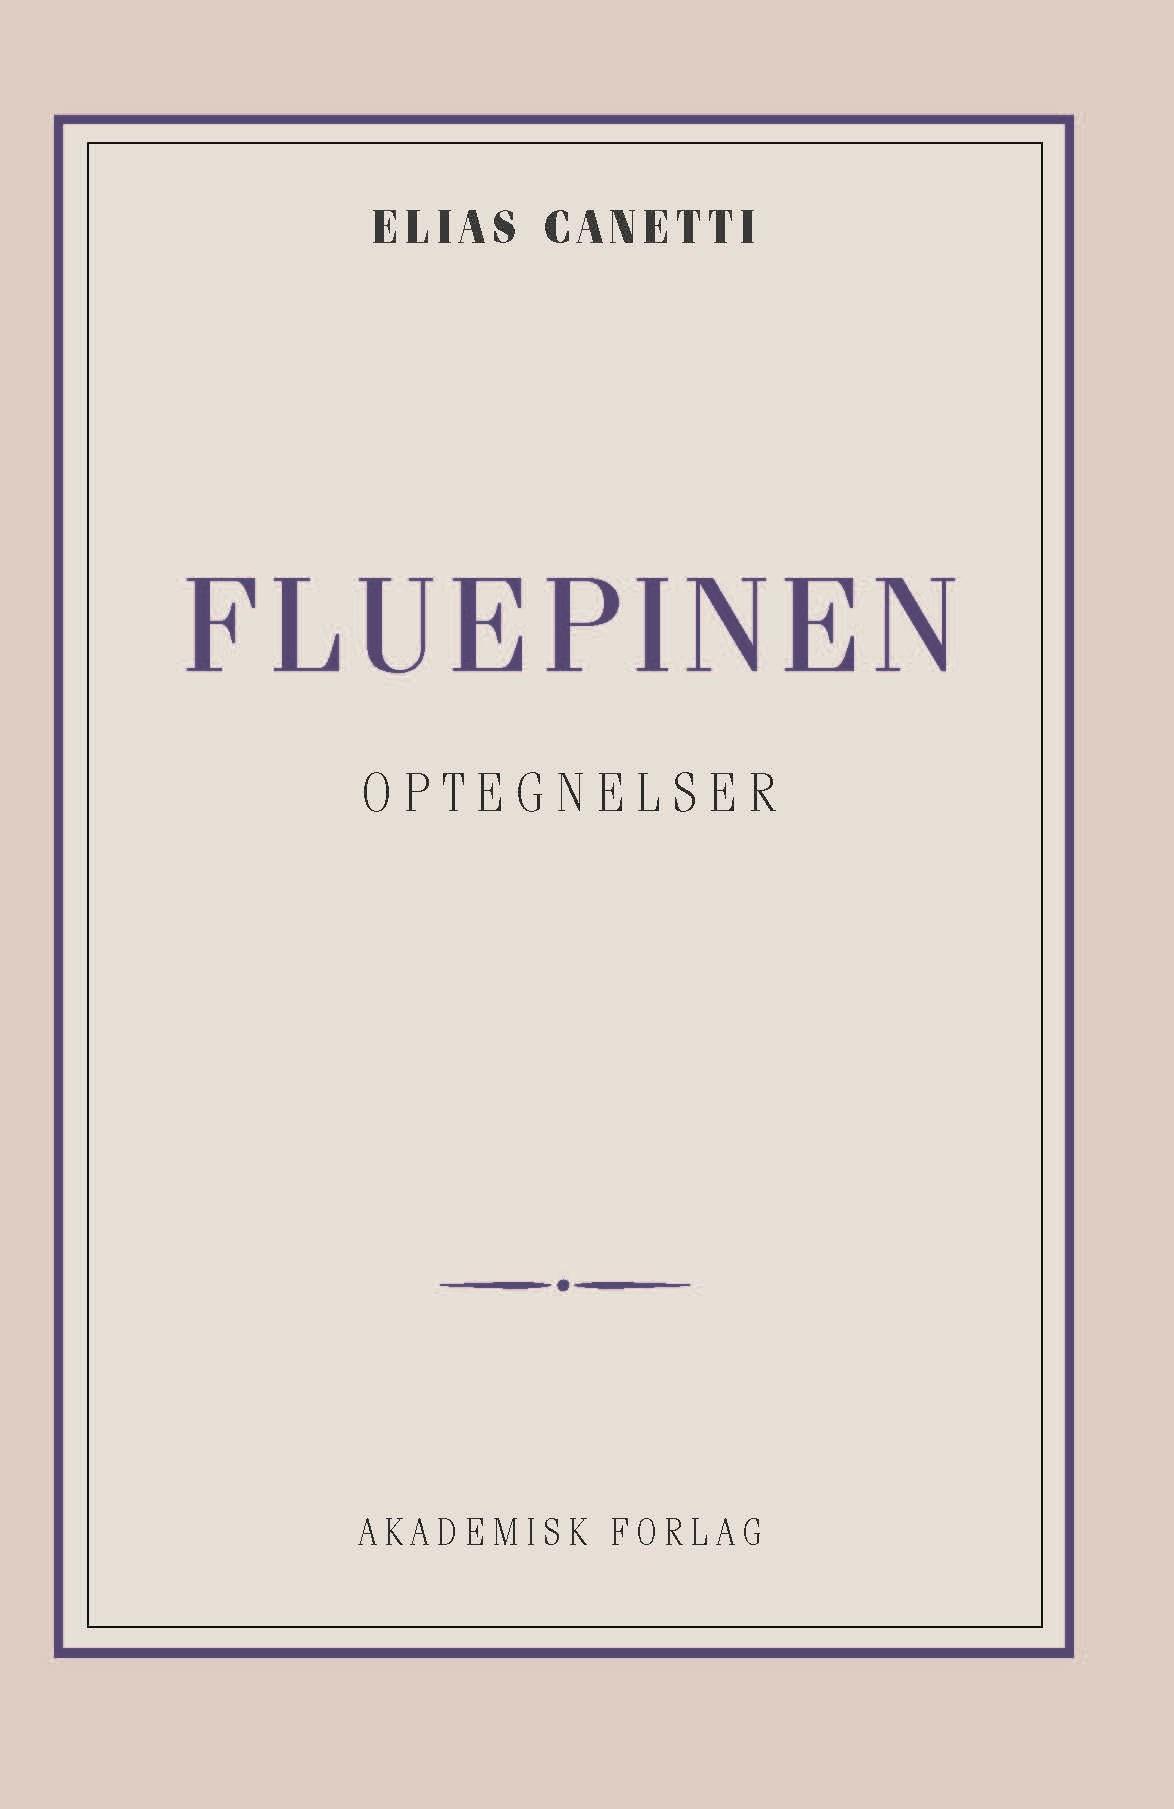 Fluepinen: optegnelser - Elias Canetti - Bøger - Akademisk Forlag - 9788750054269 - 1/3-2019